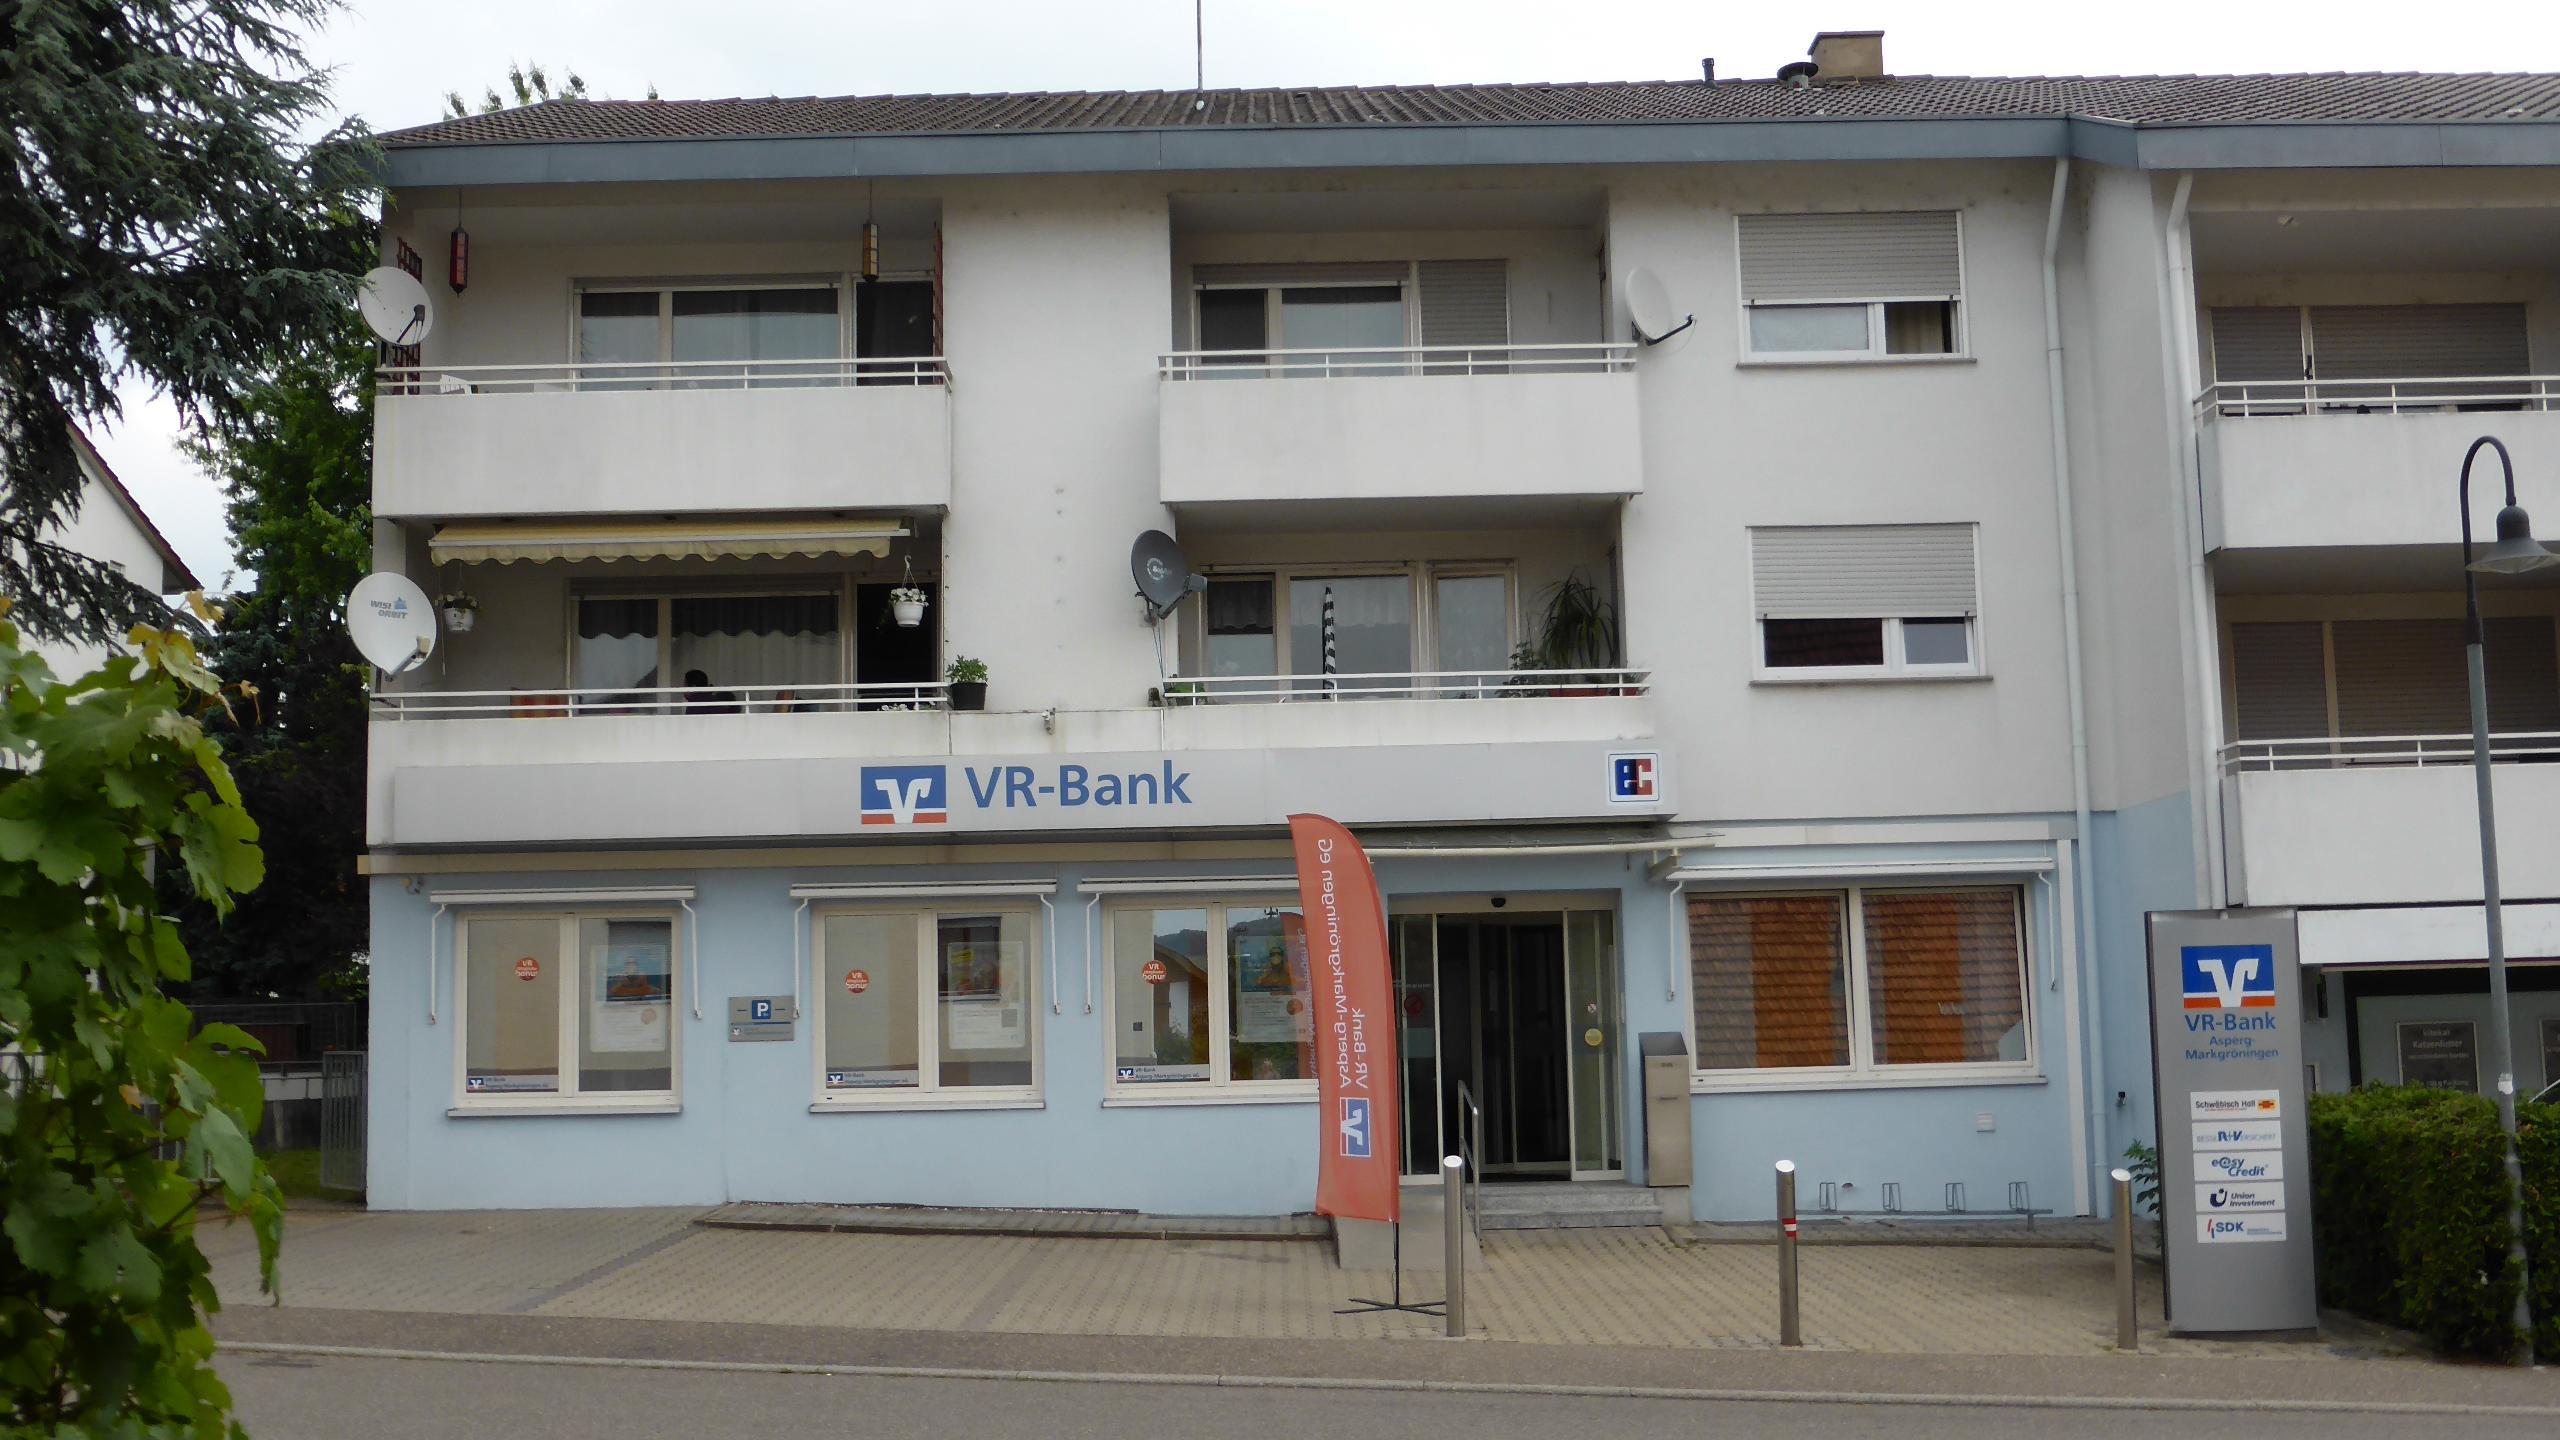 Vr Bank Asperg Markgroningen Eg Geschaftsstelle Oberriexingen Oberriexingen Albertstrasse 4 Offnungszeiten Angebote